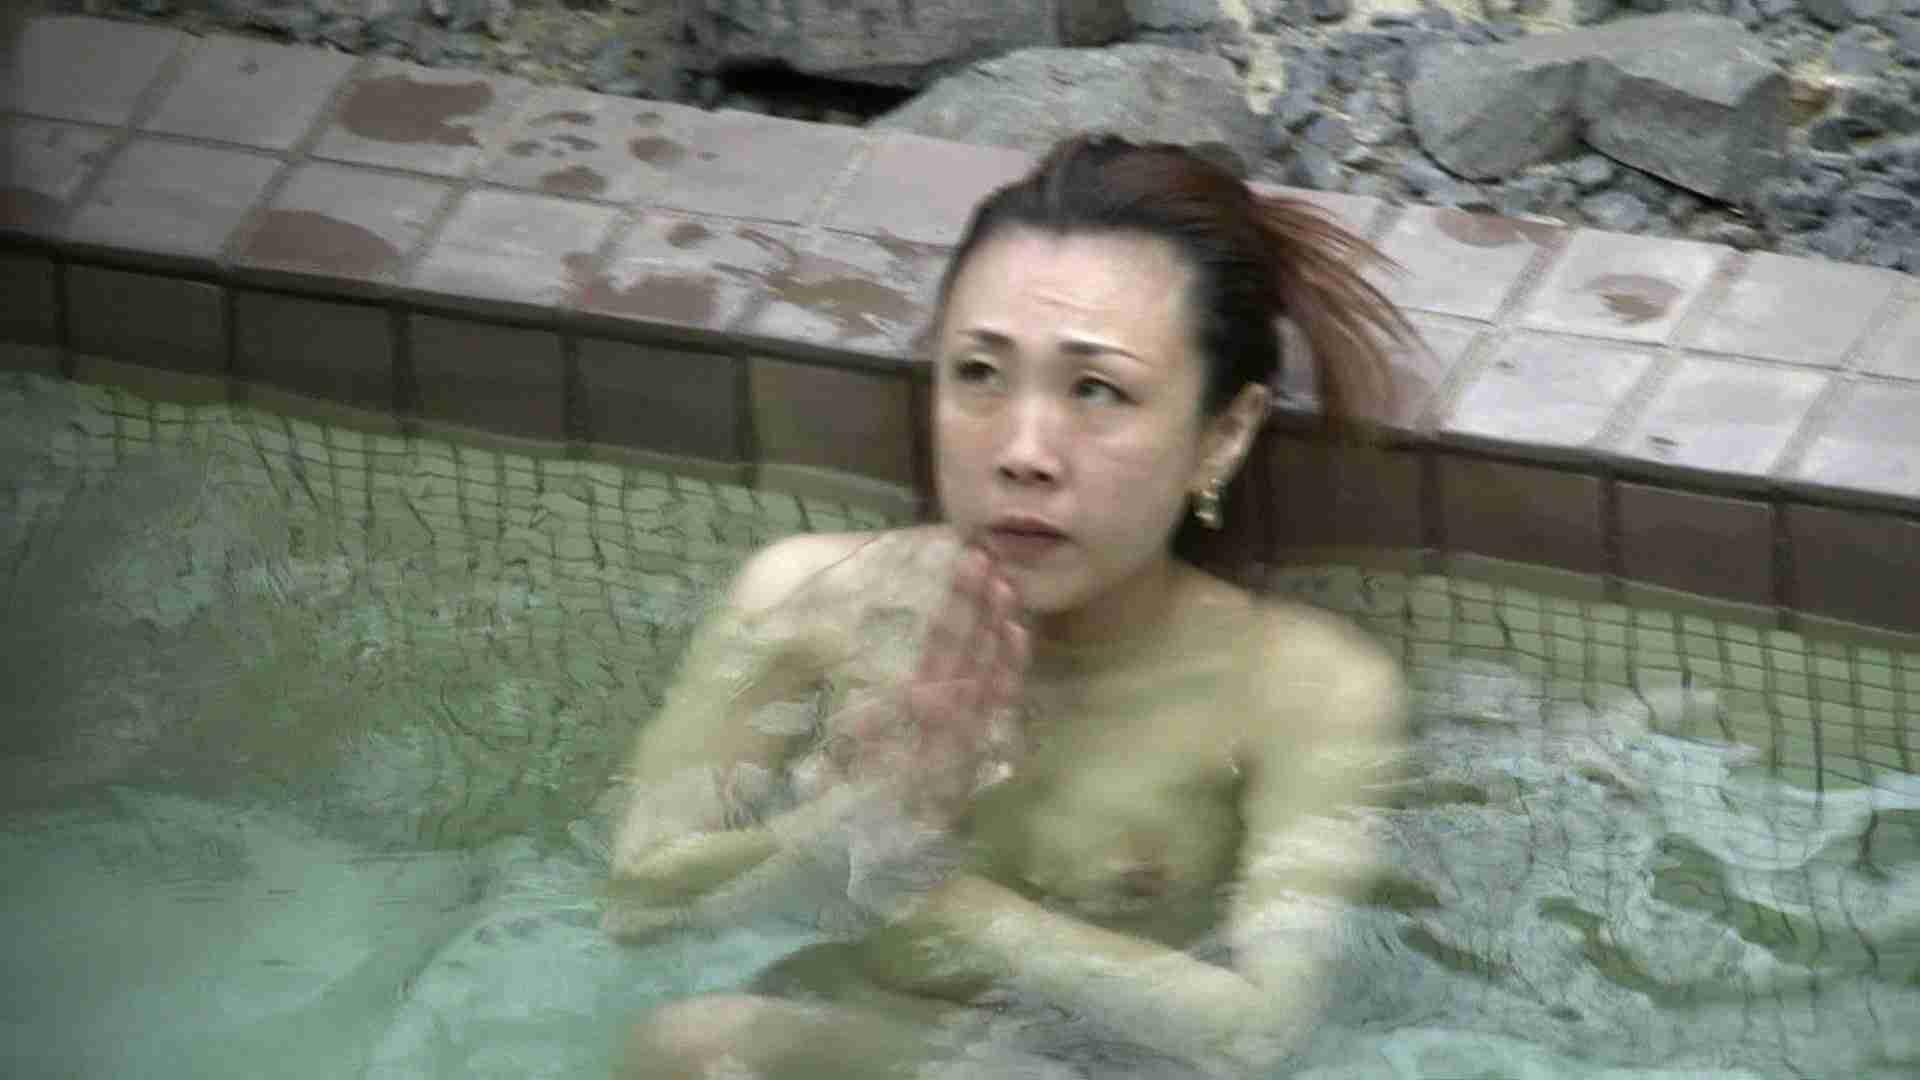 Aquaな露天風呂Vol.654 HなOL | 盗撮  60pic 45